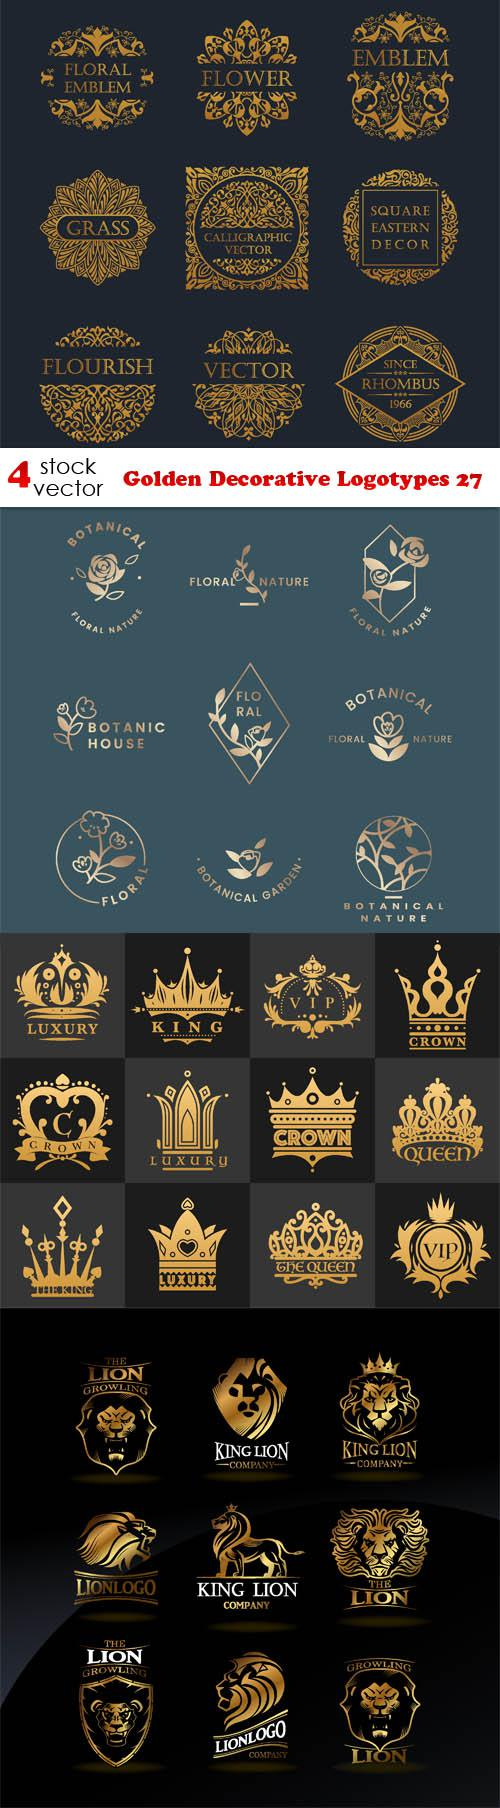 Golden Decorative Logotypes 27